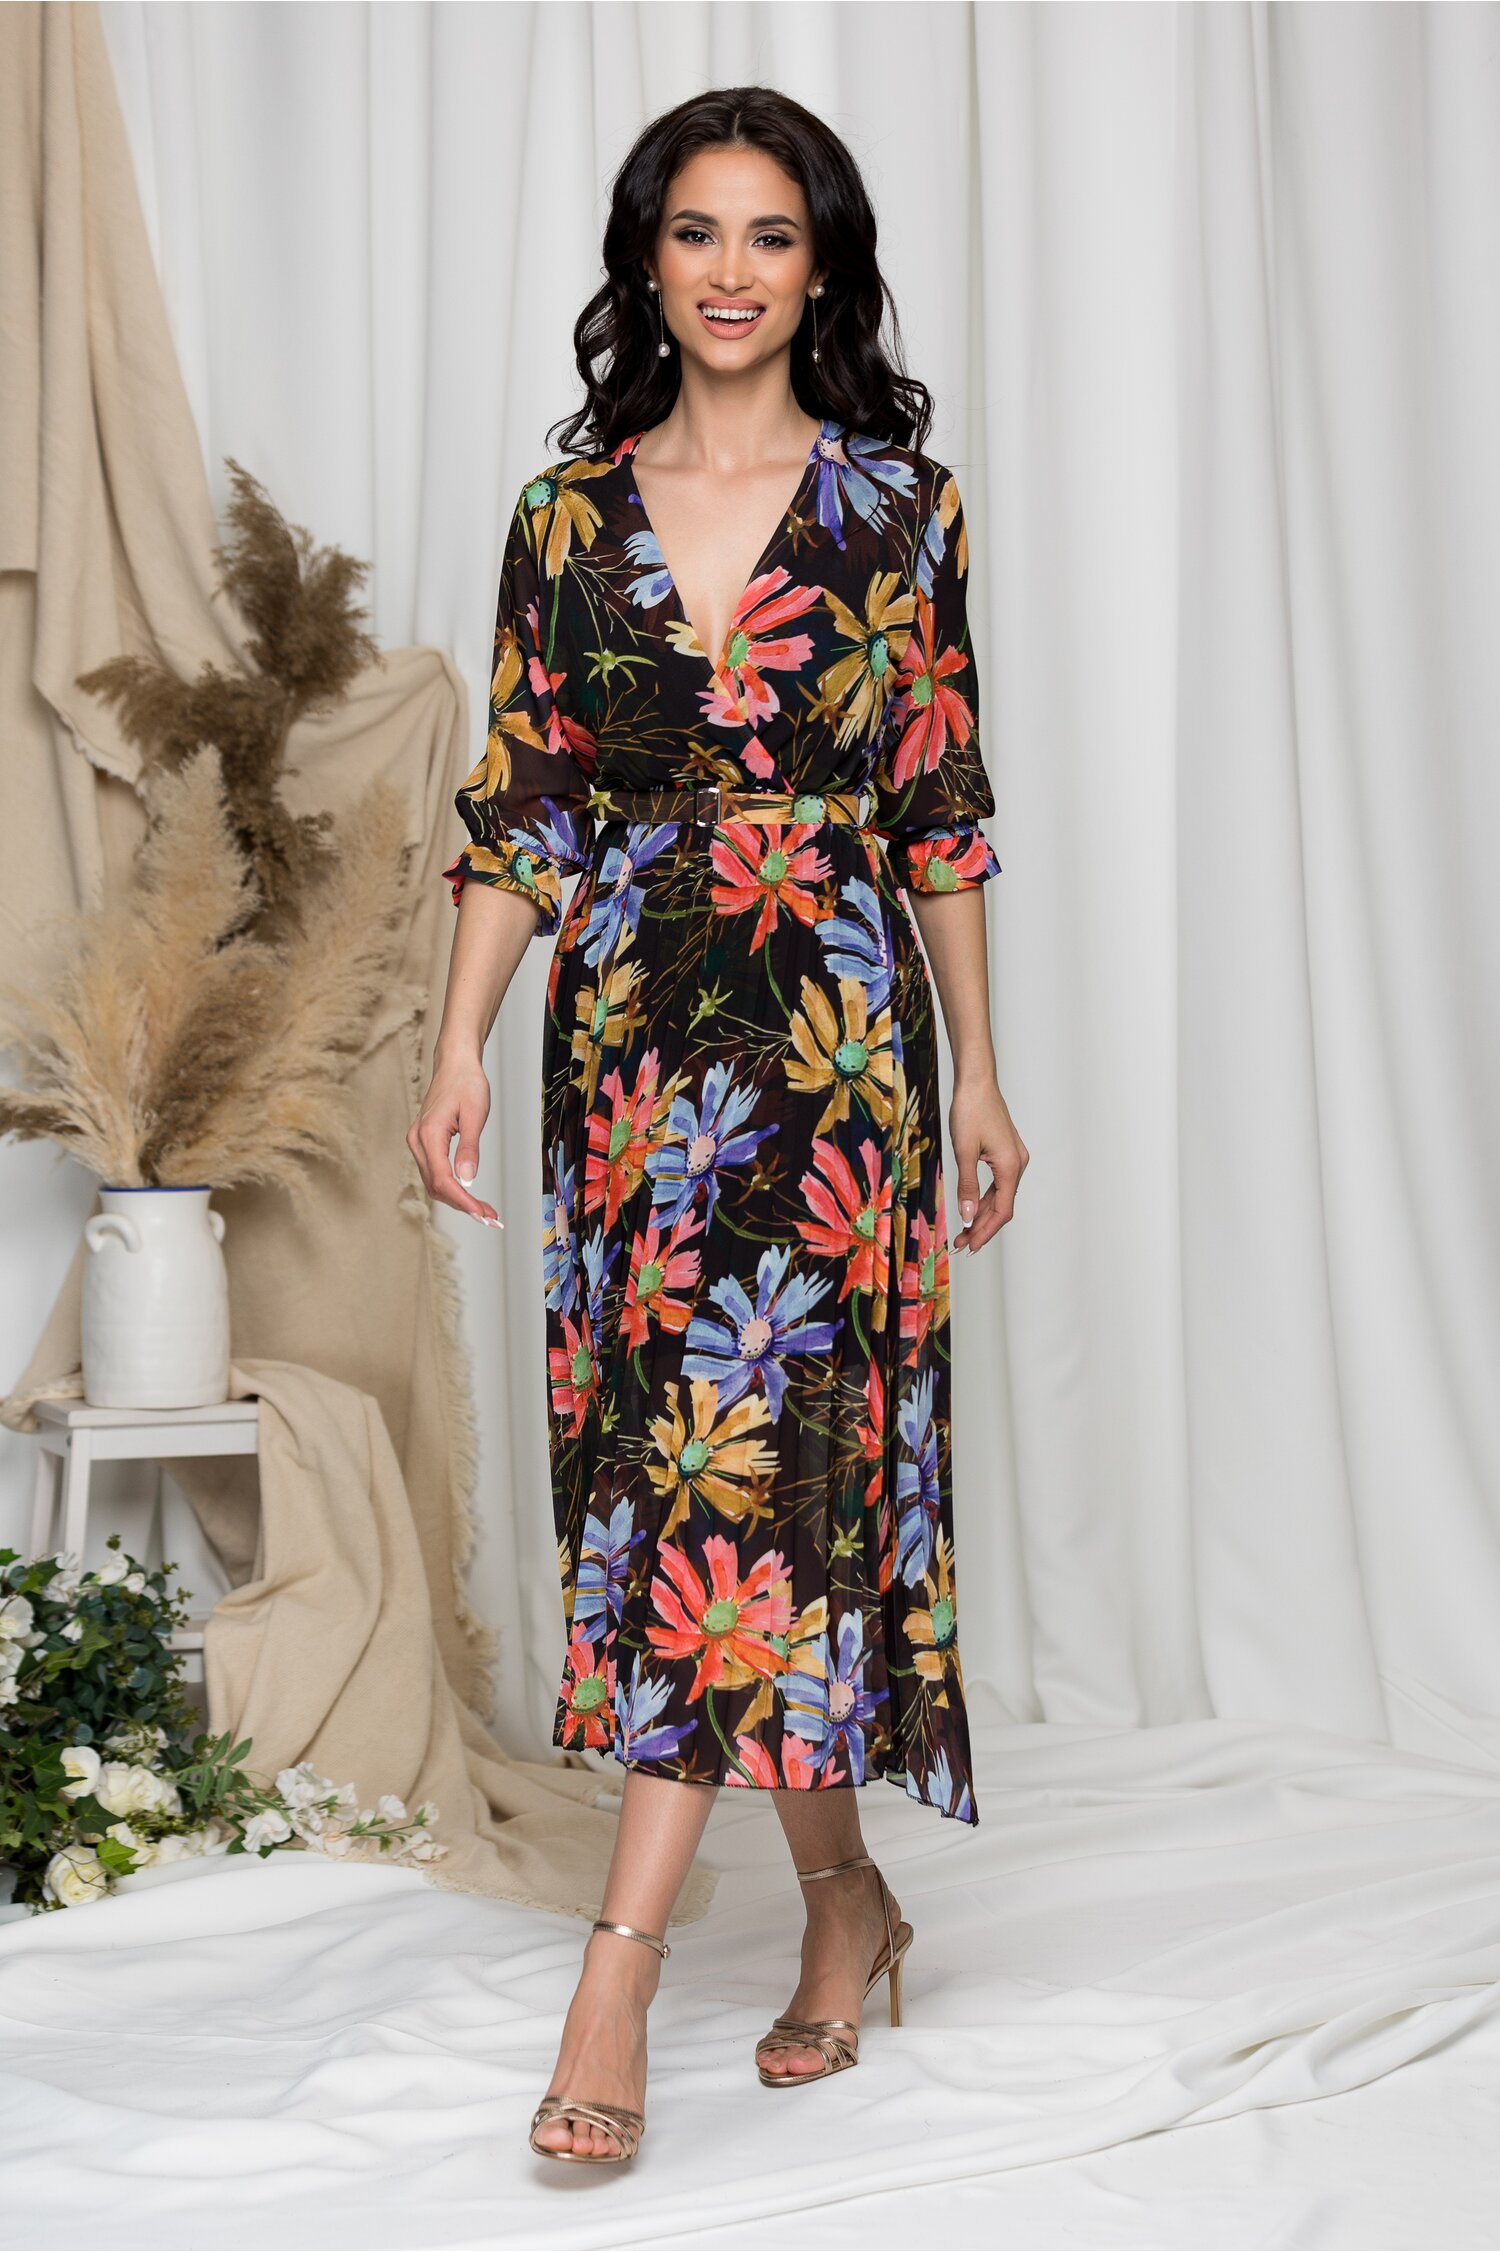 Rochie Beatrice neagra cu imprimeu floral imagine dyfashion.ro 2021